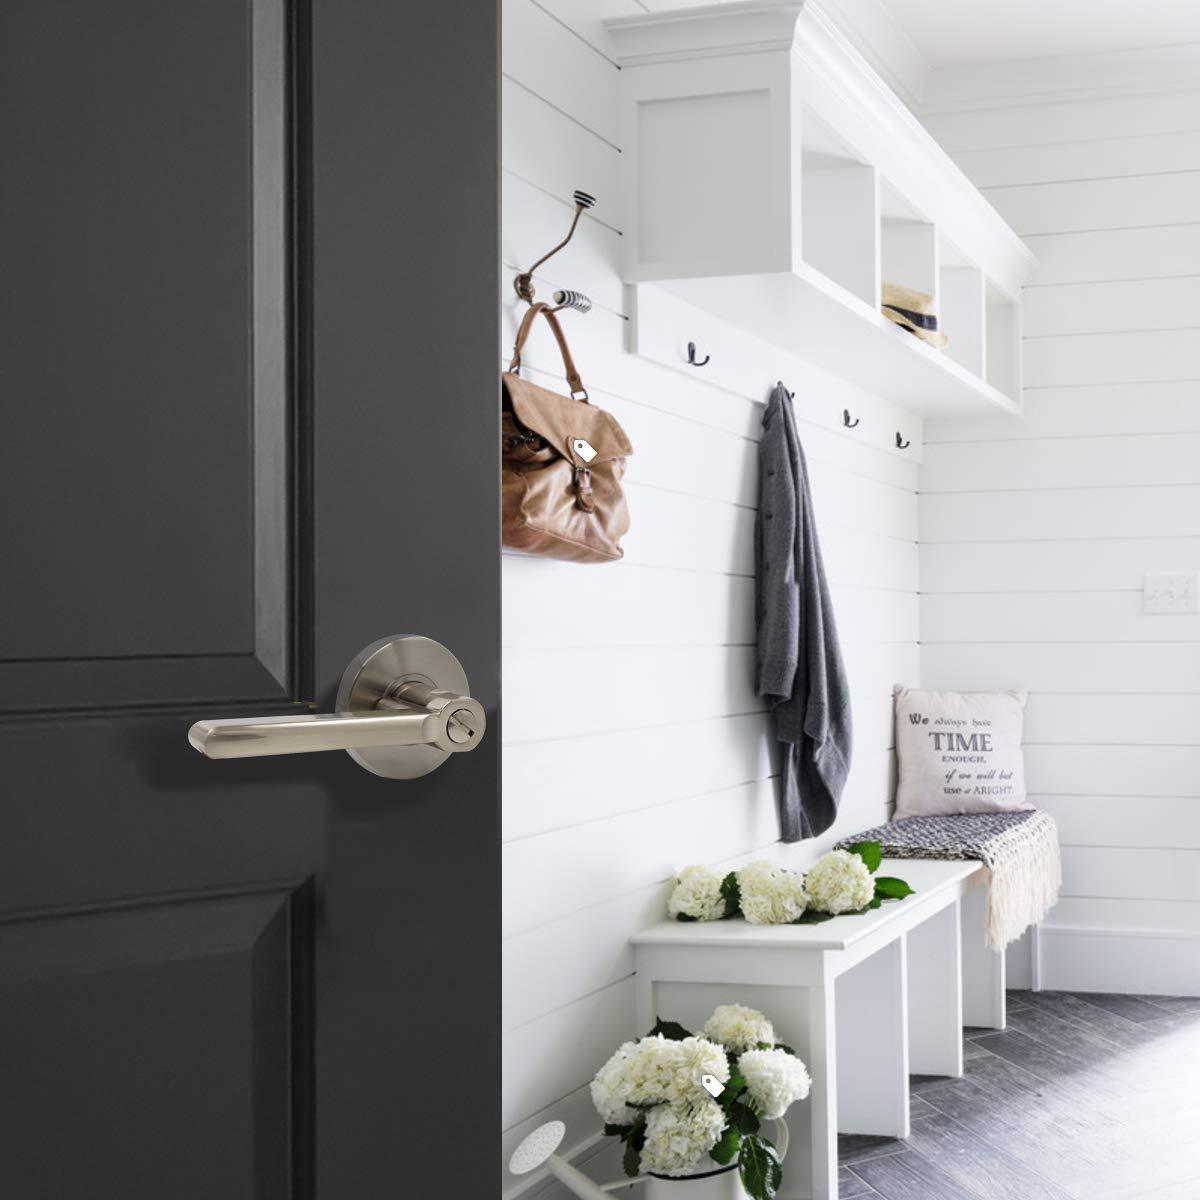 Probrico Bed/Bath Room Door Lever Modern Flat Handles in Satin Nickel, Privacy Door Lever Locks, Contractor Pack(10Pack) by Probrico (Image #8)